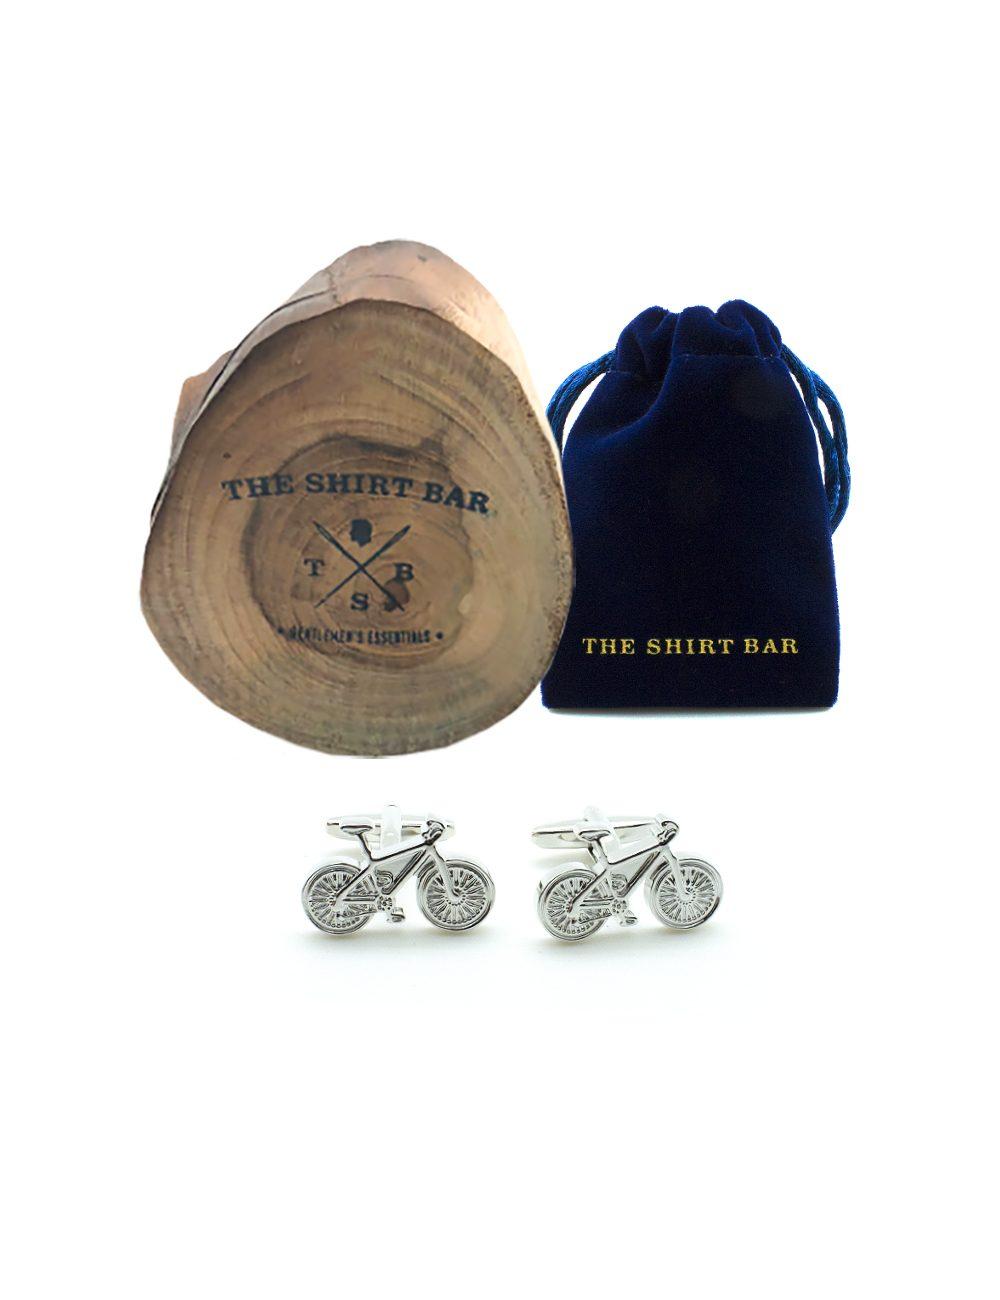 Silver Racing Bicycle Cufflink 0107-004